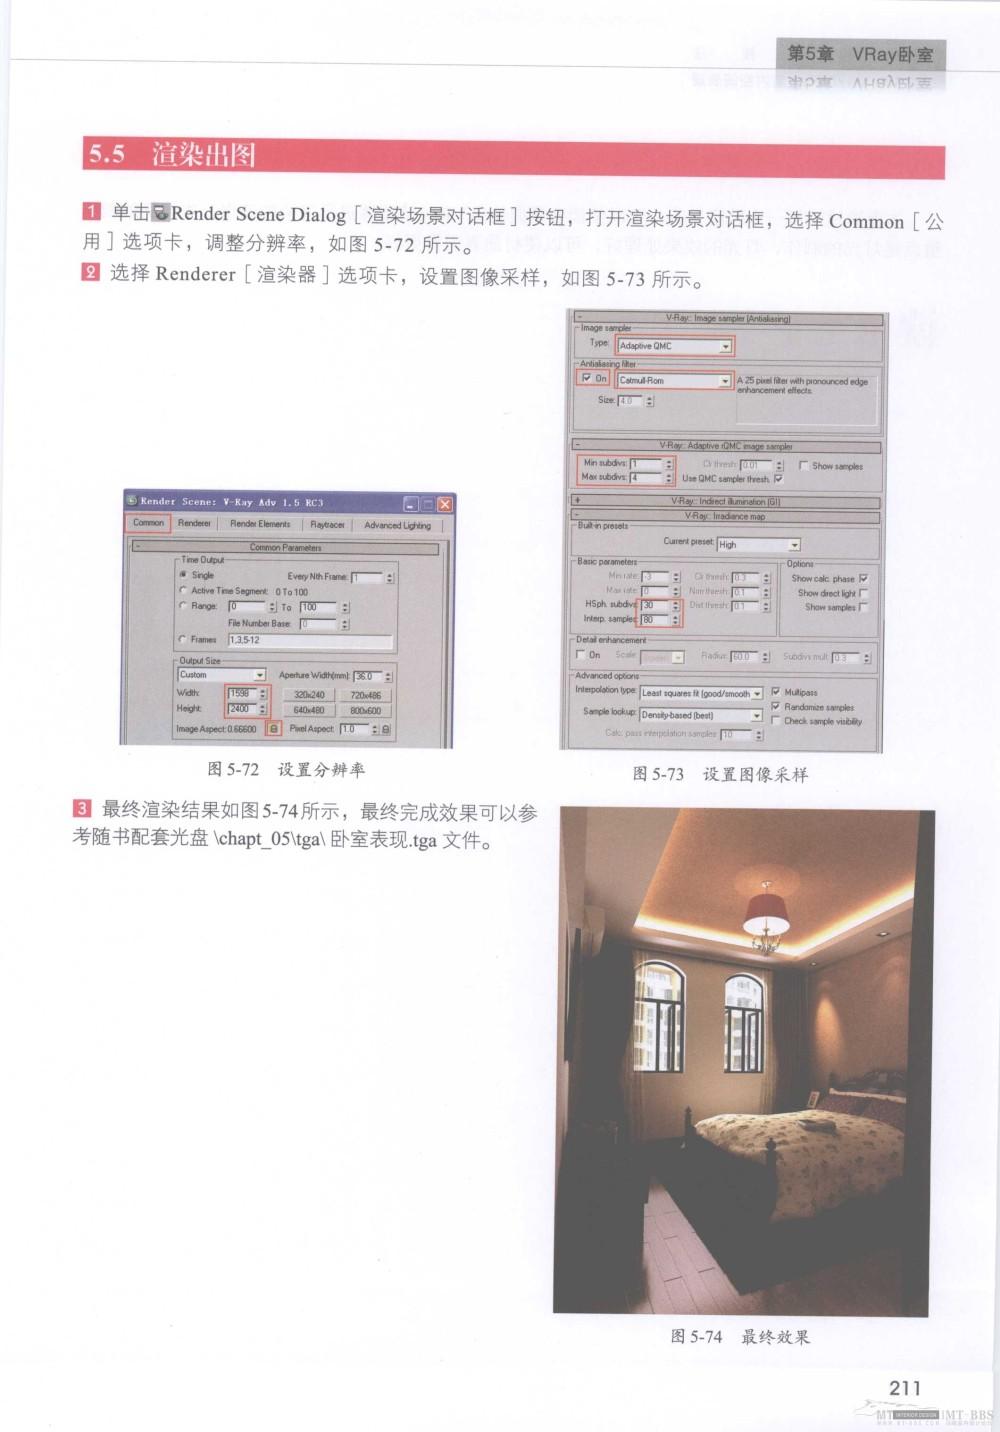 水晶石技法-3ds_Max&VRay室内空间表现_水晶石技法-3ds_Max&VRay室内空间表现_页面_217.jpg